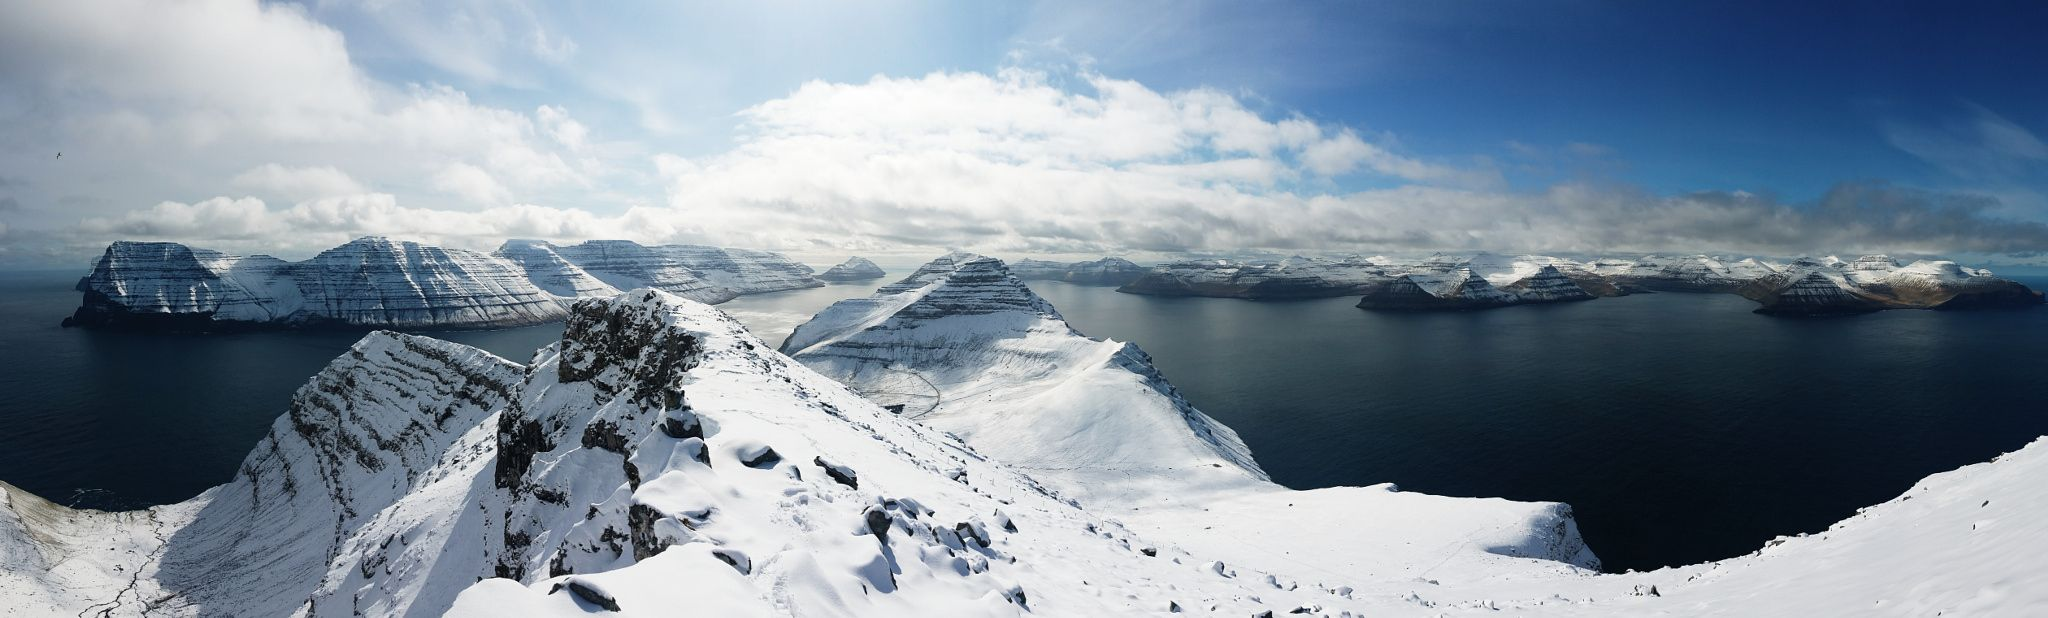 Kalsoy from Nestindar - Faroe Islands by Simon Dubreuil #travel #landscape #nature #faroeislands